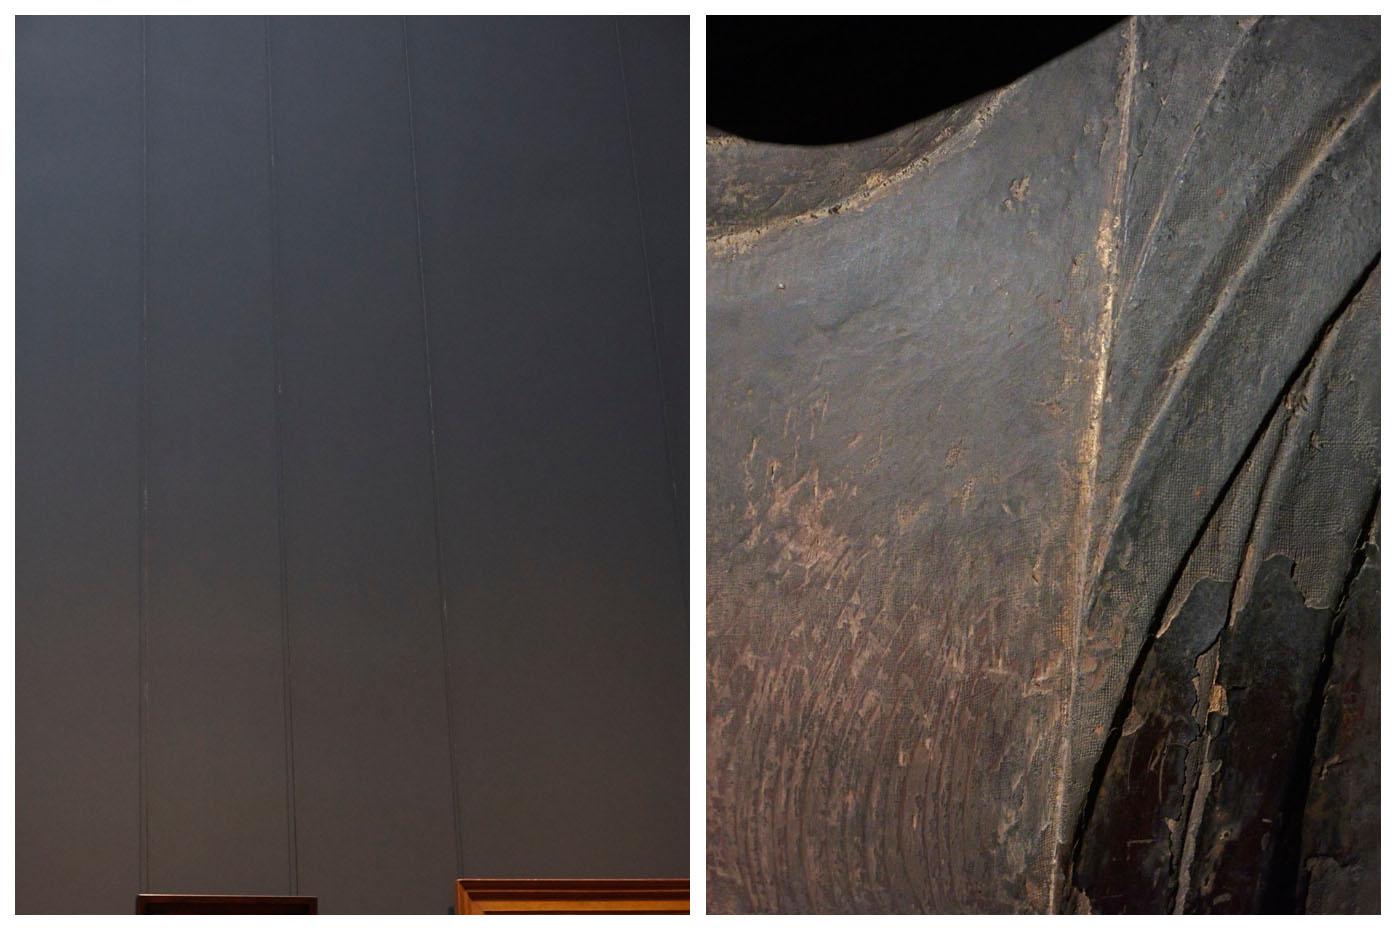 NIEUWENHUIZE NIEUWENHUIZE - Rijksmuseum IMG_3351